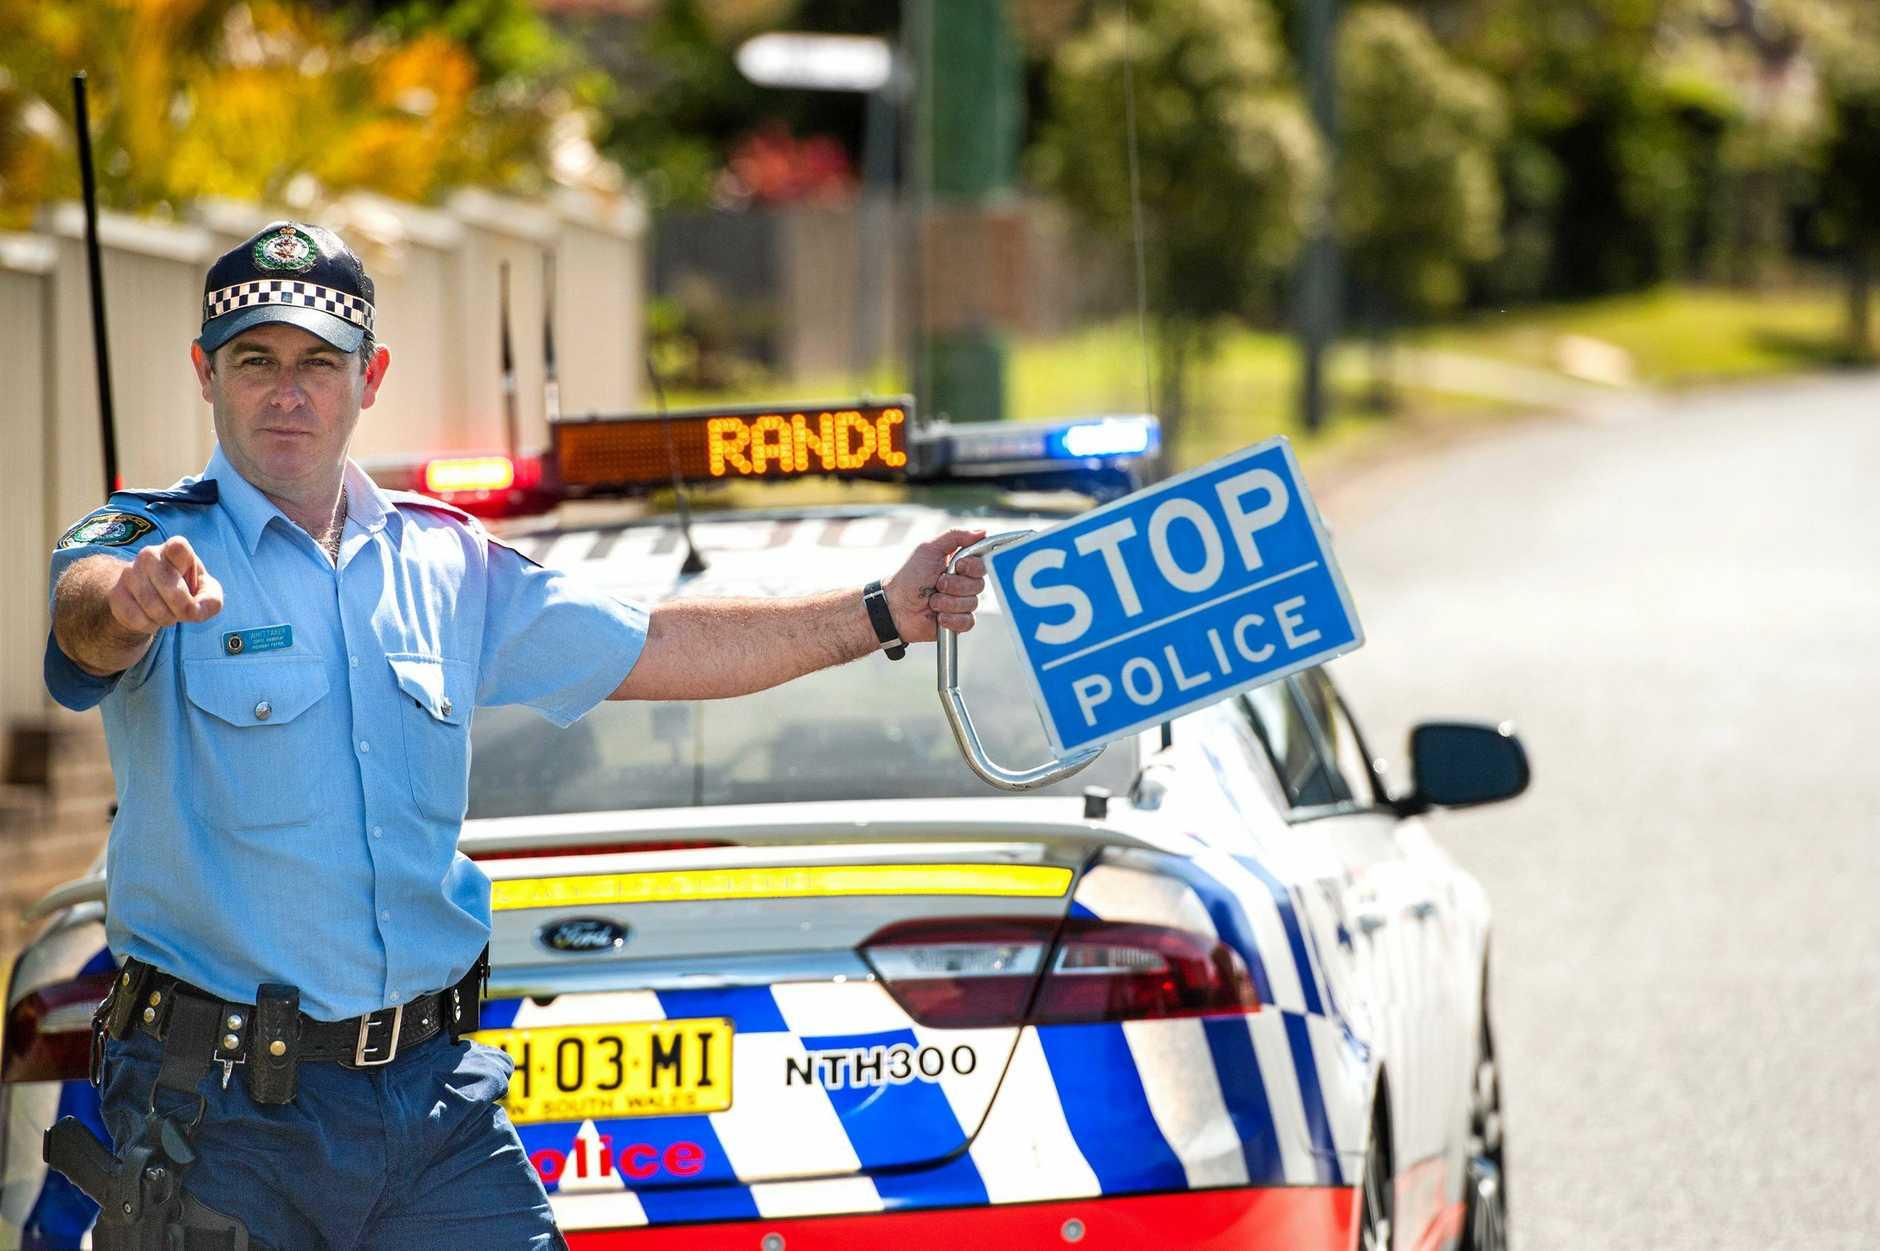 NSW police speed gun, radar.random breath testingSnr. Const  Mark Whittaker. 07 October 2016